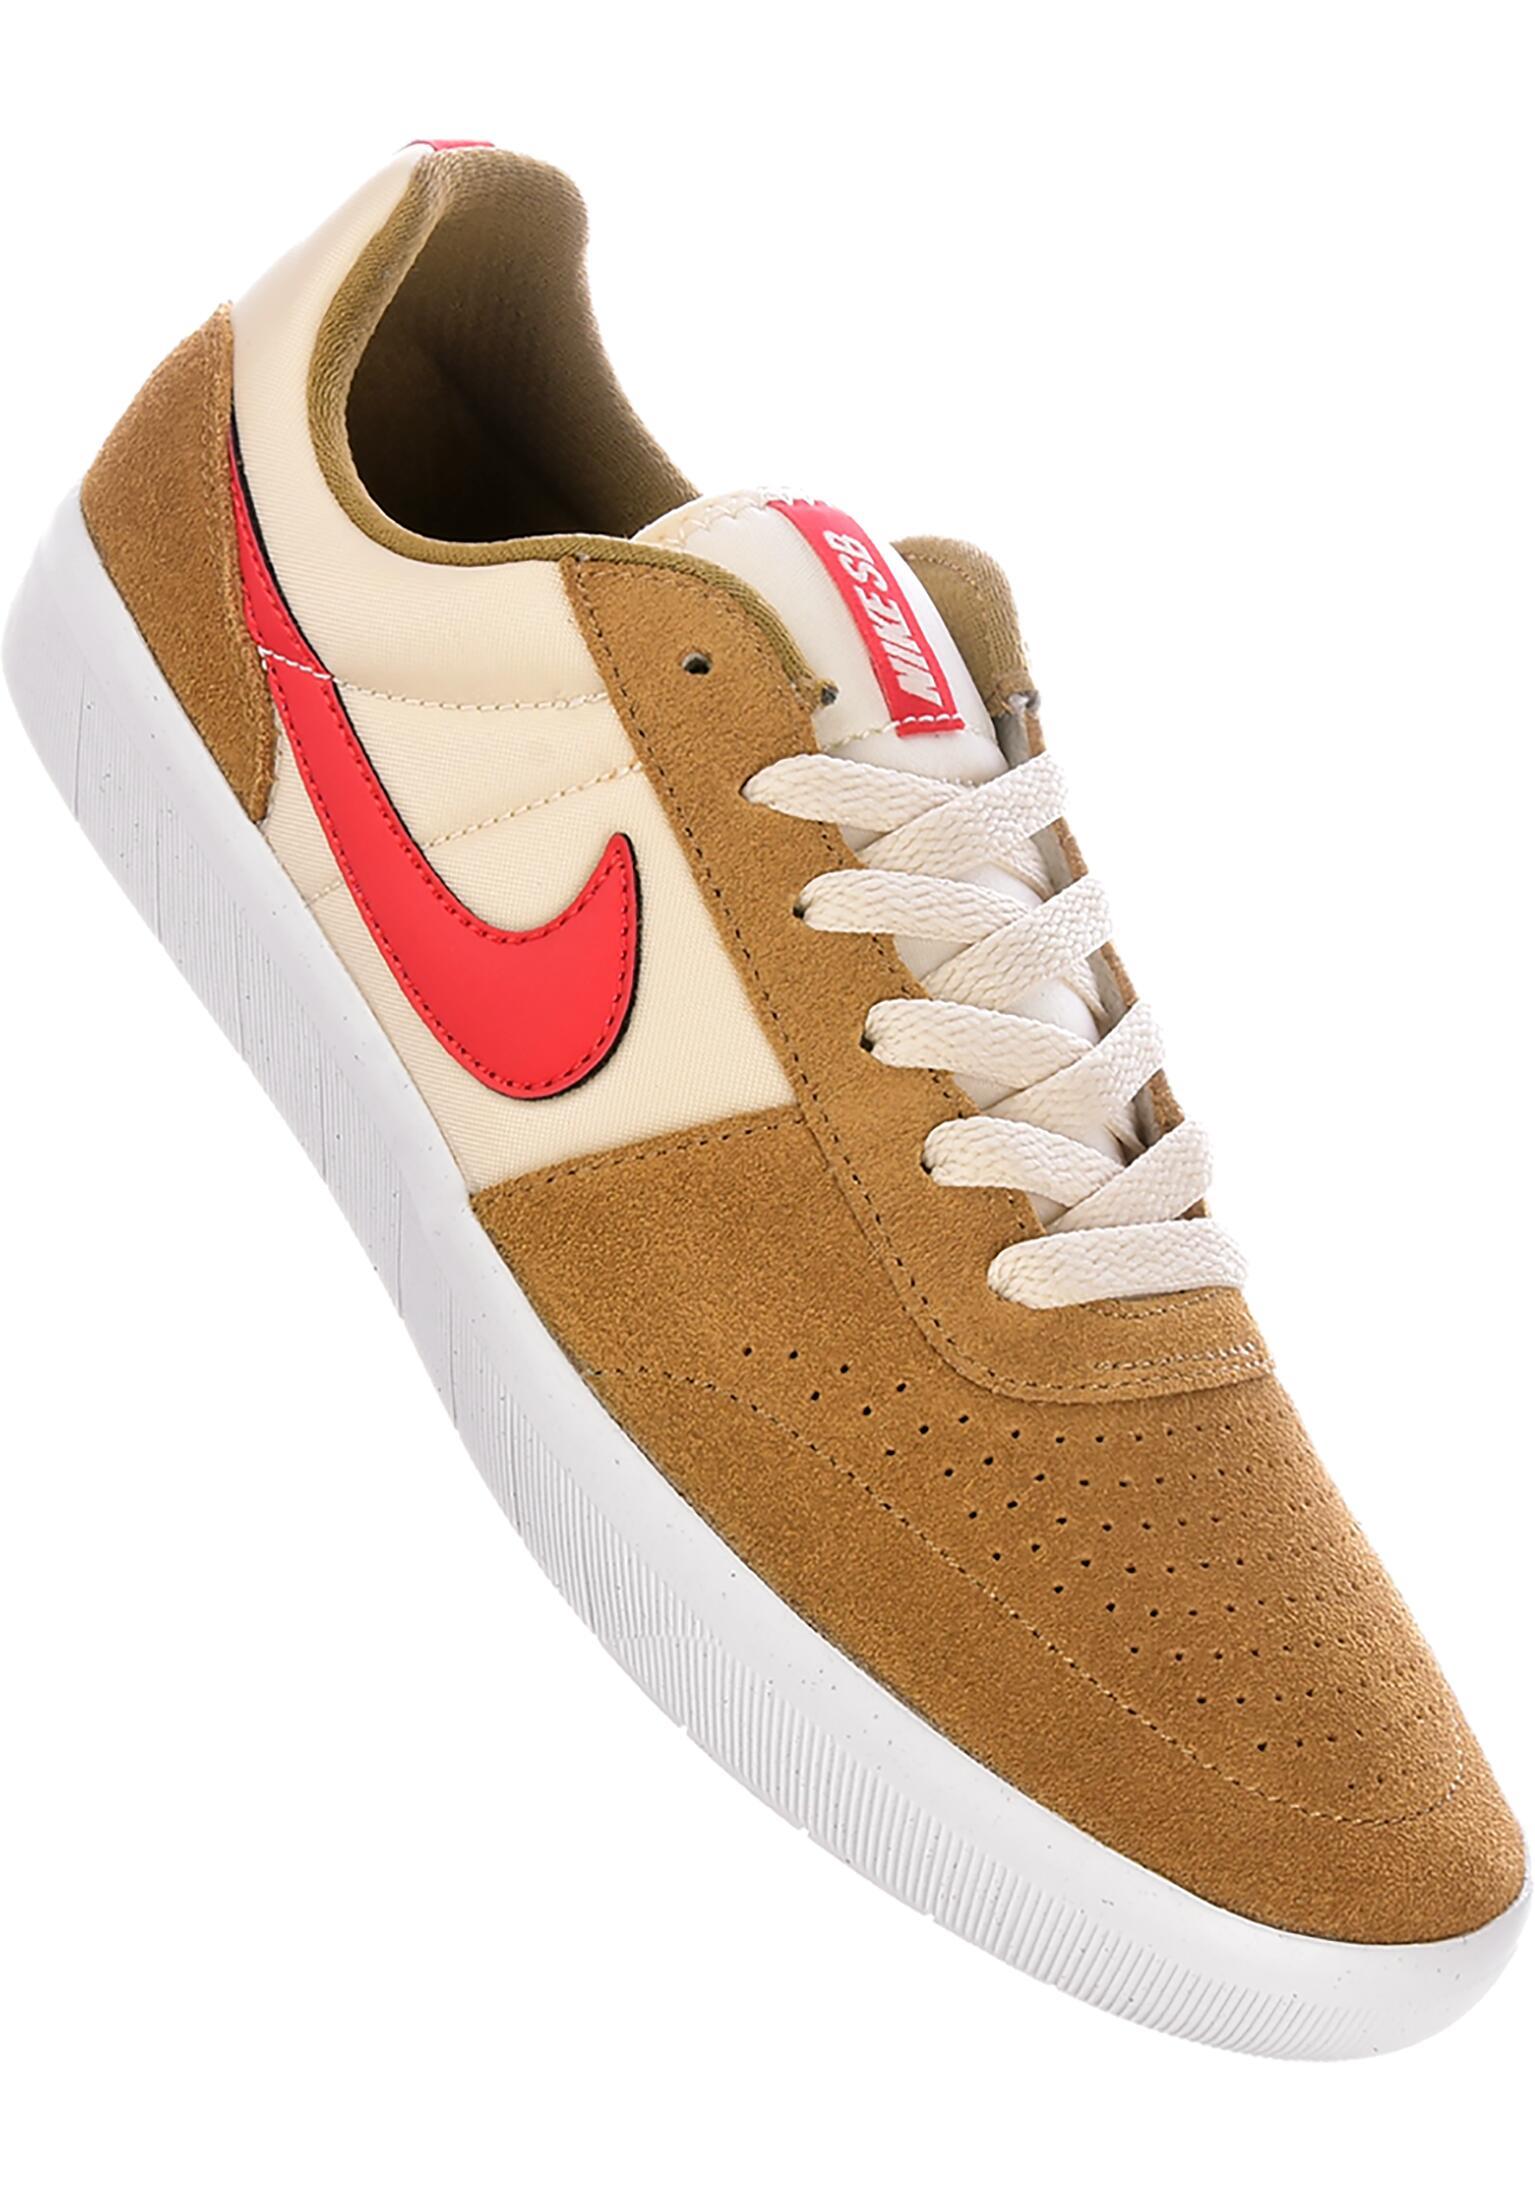 8098fbc330 Team Classic Nike SB Alle Schuhe in beige-red-lightcream für Herren   Titus